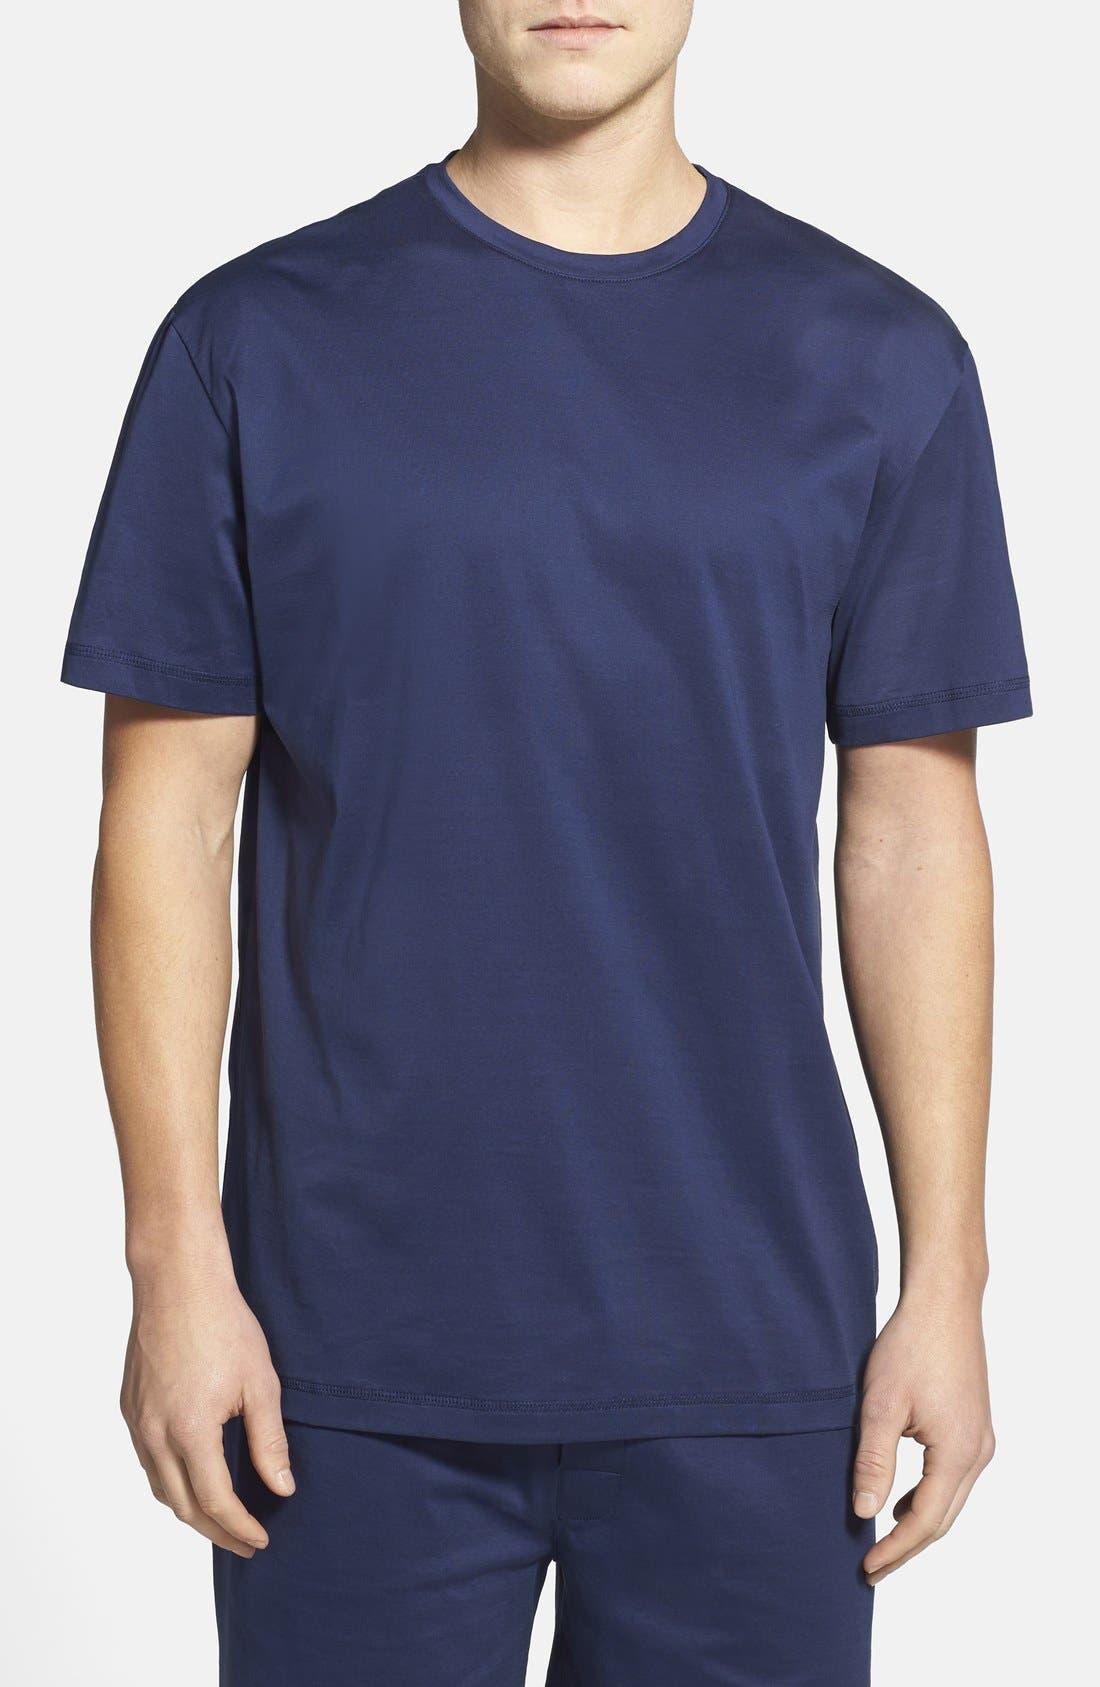 Main Image - Majestic International 'Down Time' Crewneck T-Shirt